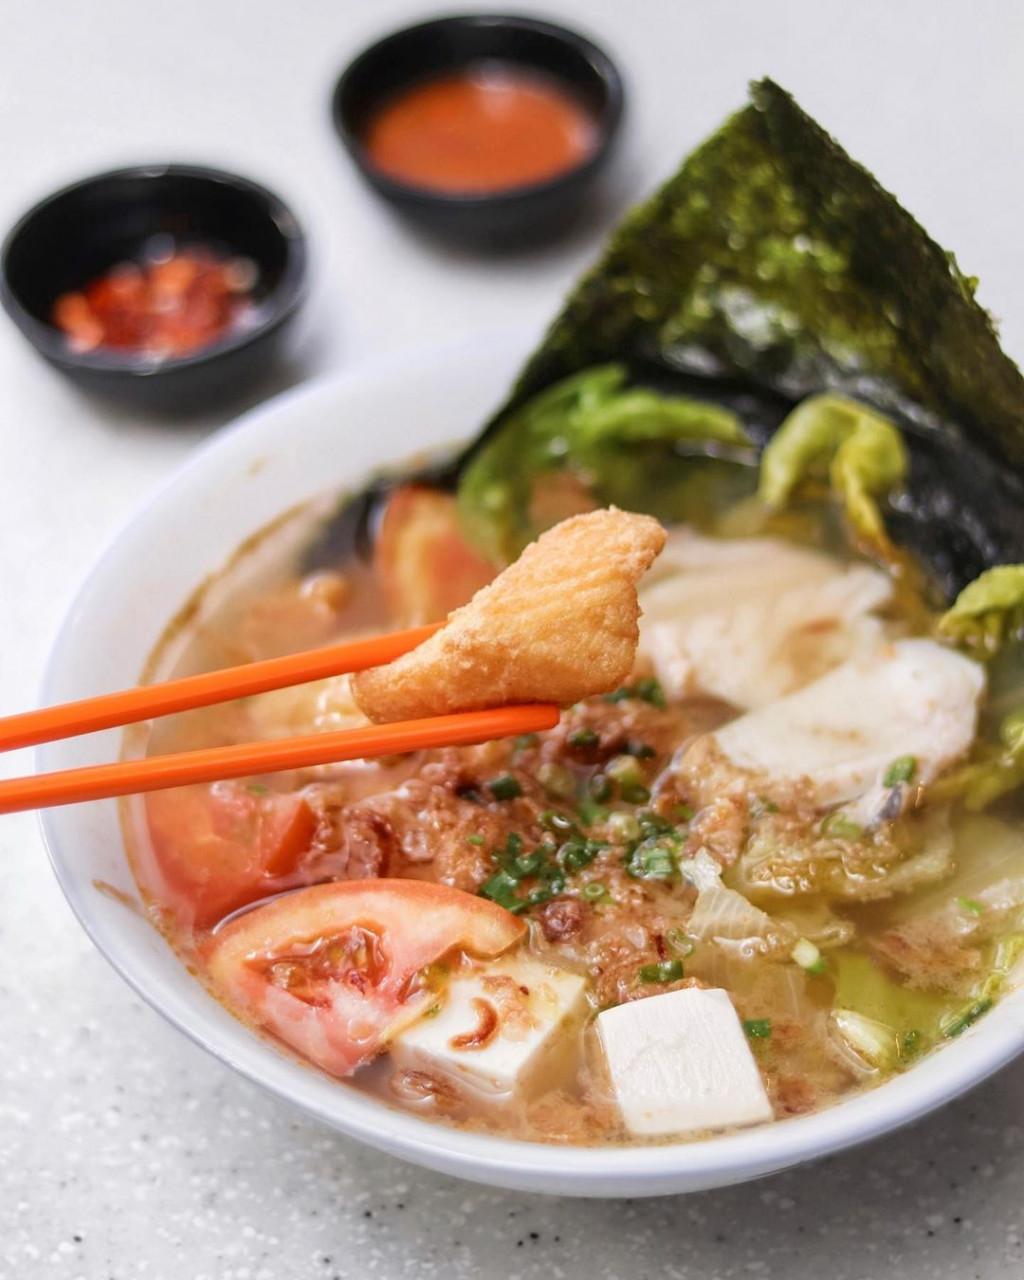 No Milk - fish soup